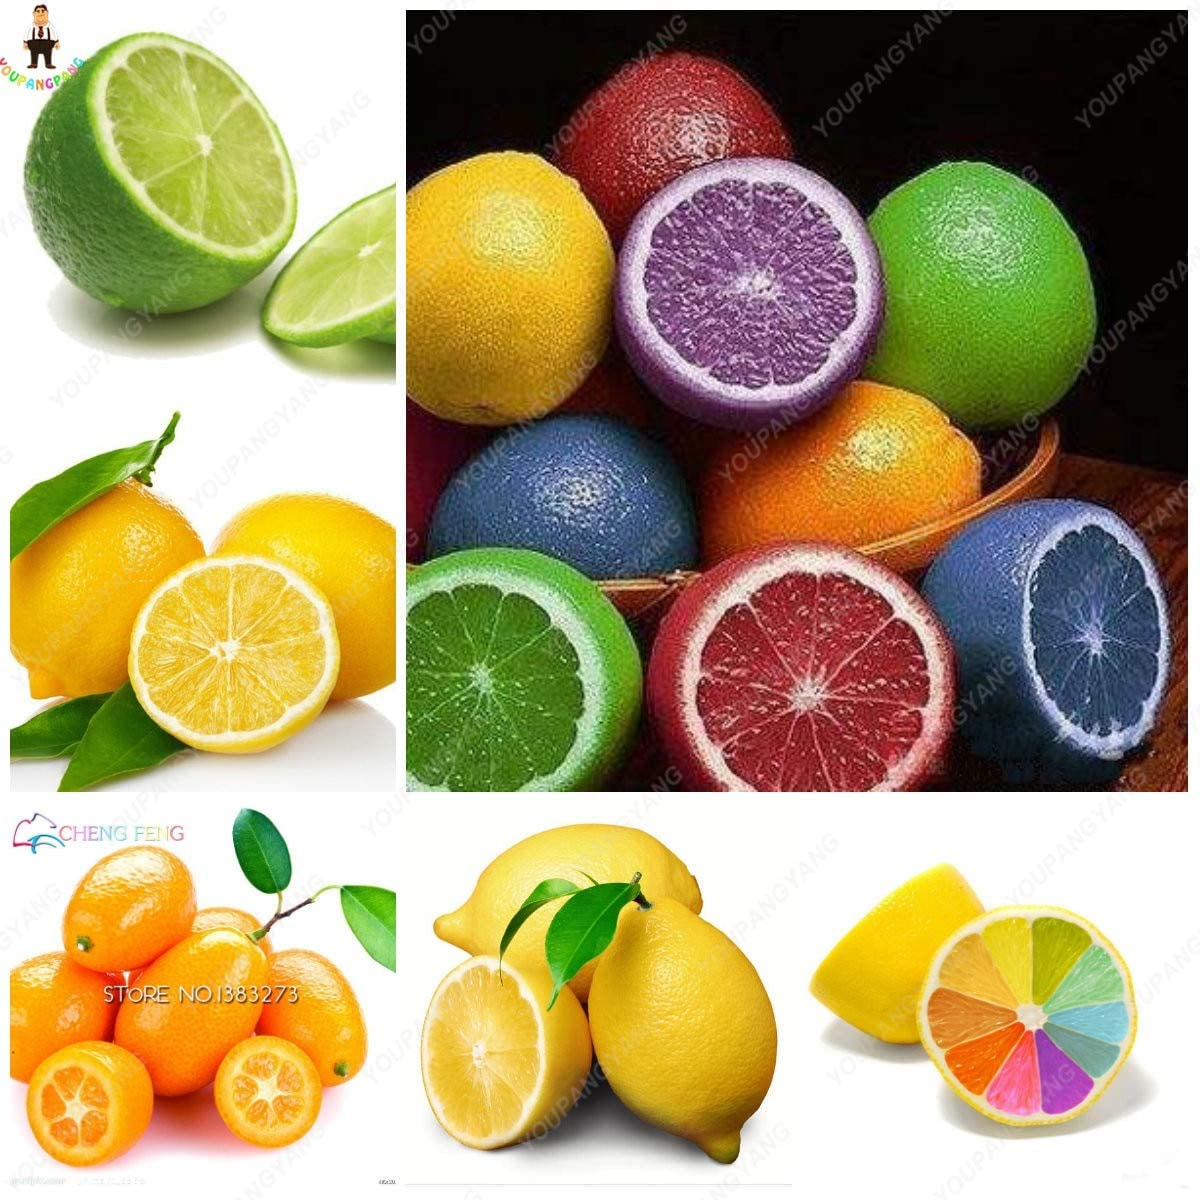 AGROBITS 20Pcs Japanese Rainbow Lemon Bonsai Dwarf Lime Tea Fruit Plants Garden Organic Citrus Limon Tree Semillas de Fruta Pink